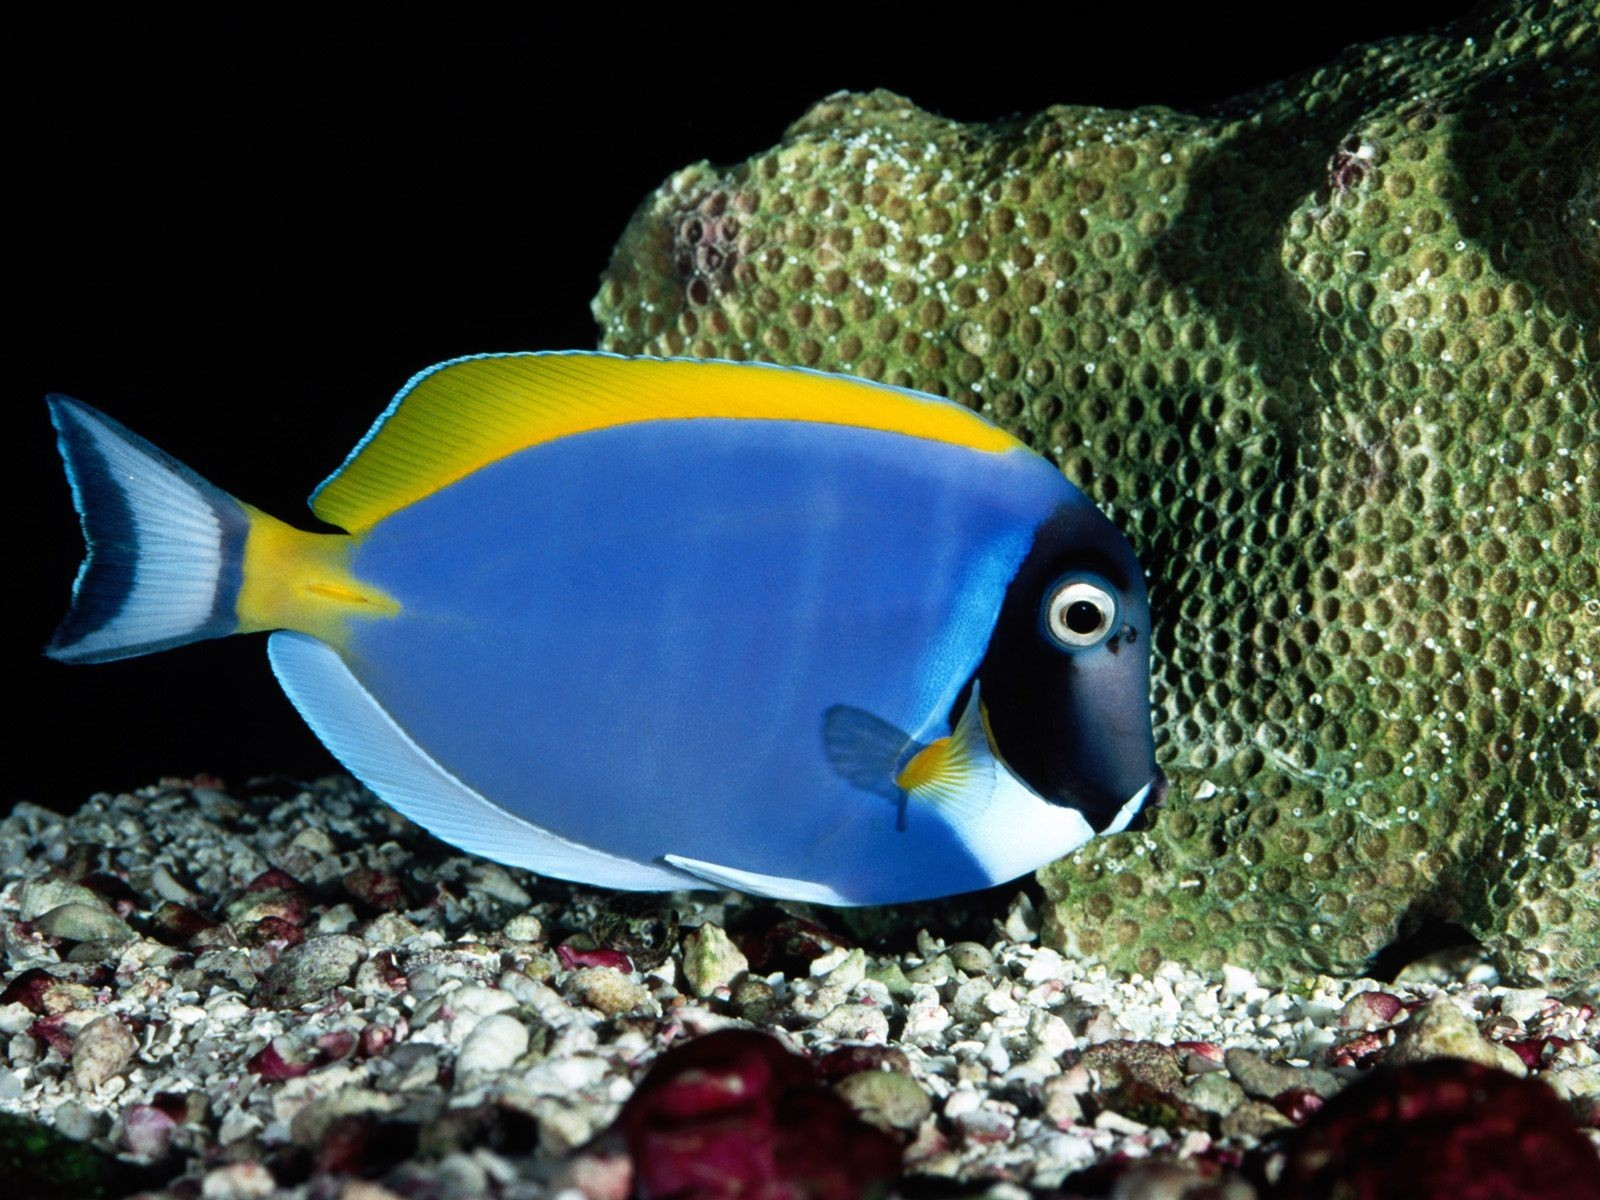 Beautiful Blue Fish Wallpaper HD Wallpapers 1600x1200